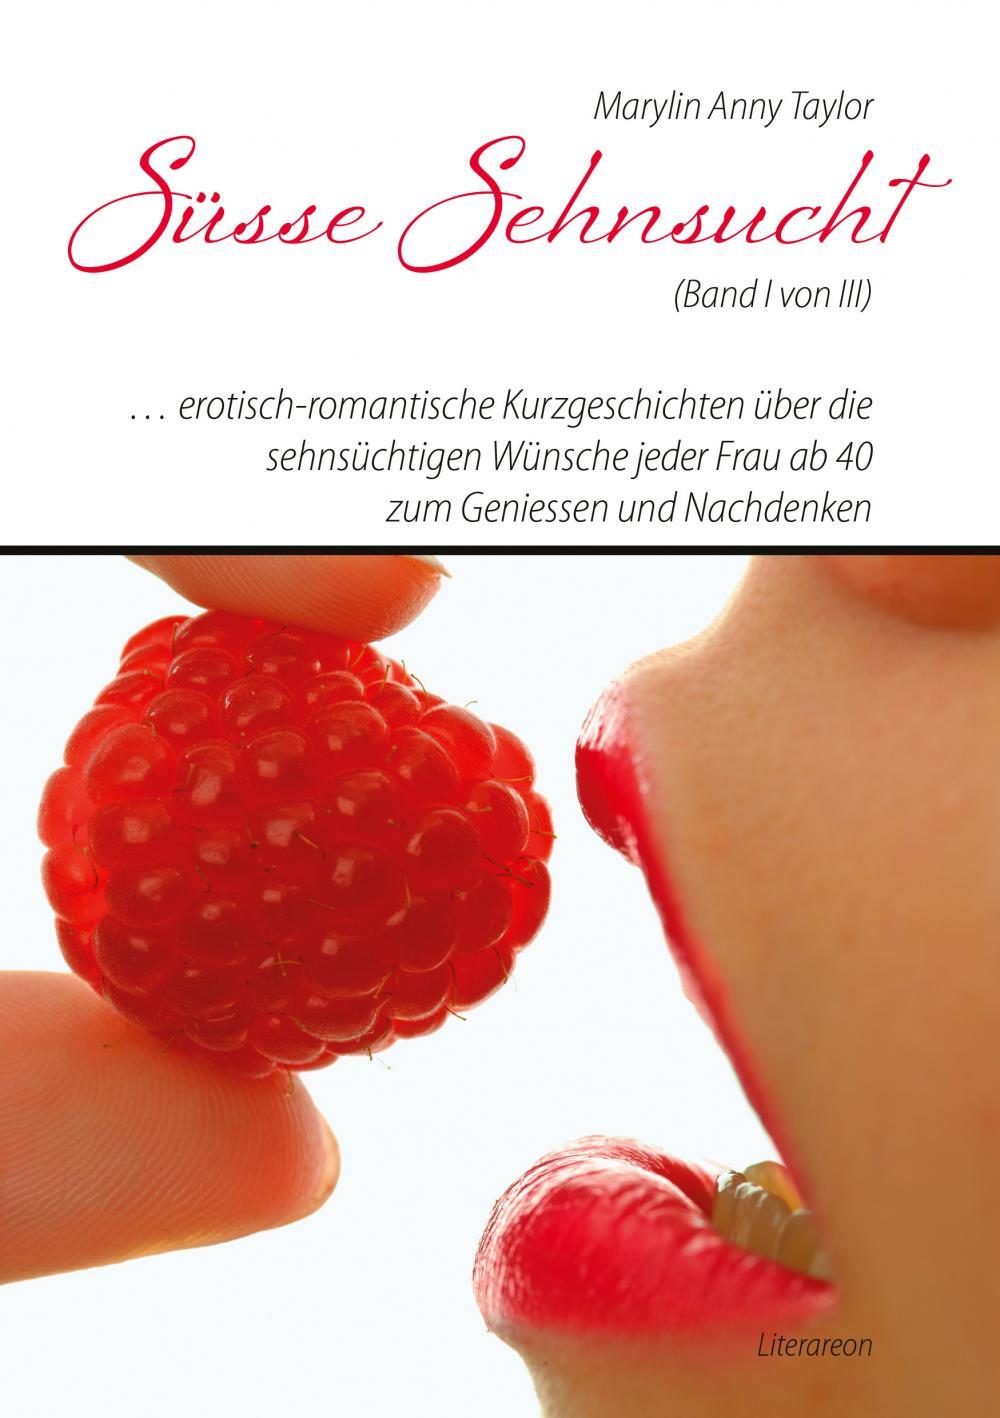 e810877efb0855 Marylin Anny Taylor: Süsse Sehnsucht (Band I von III) » Literareon